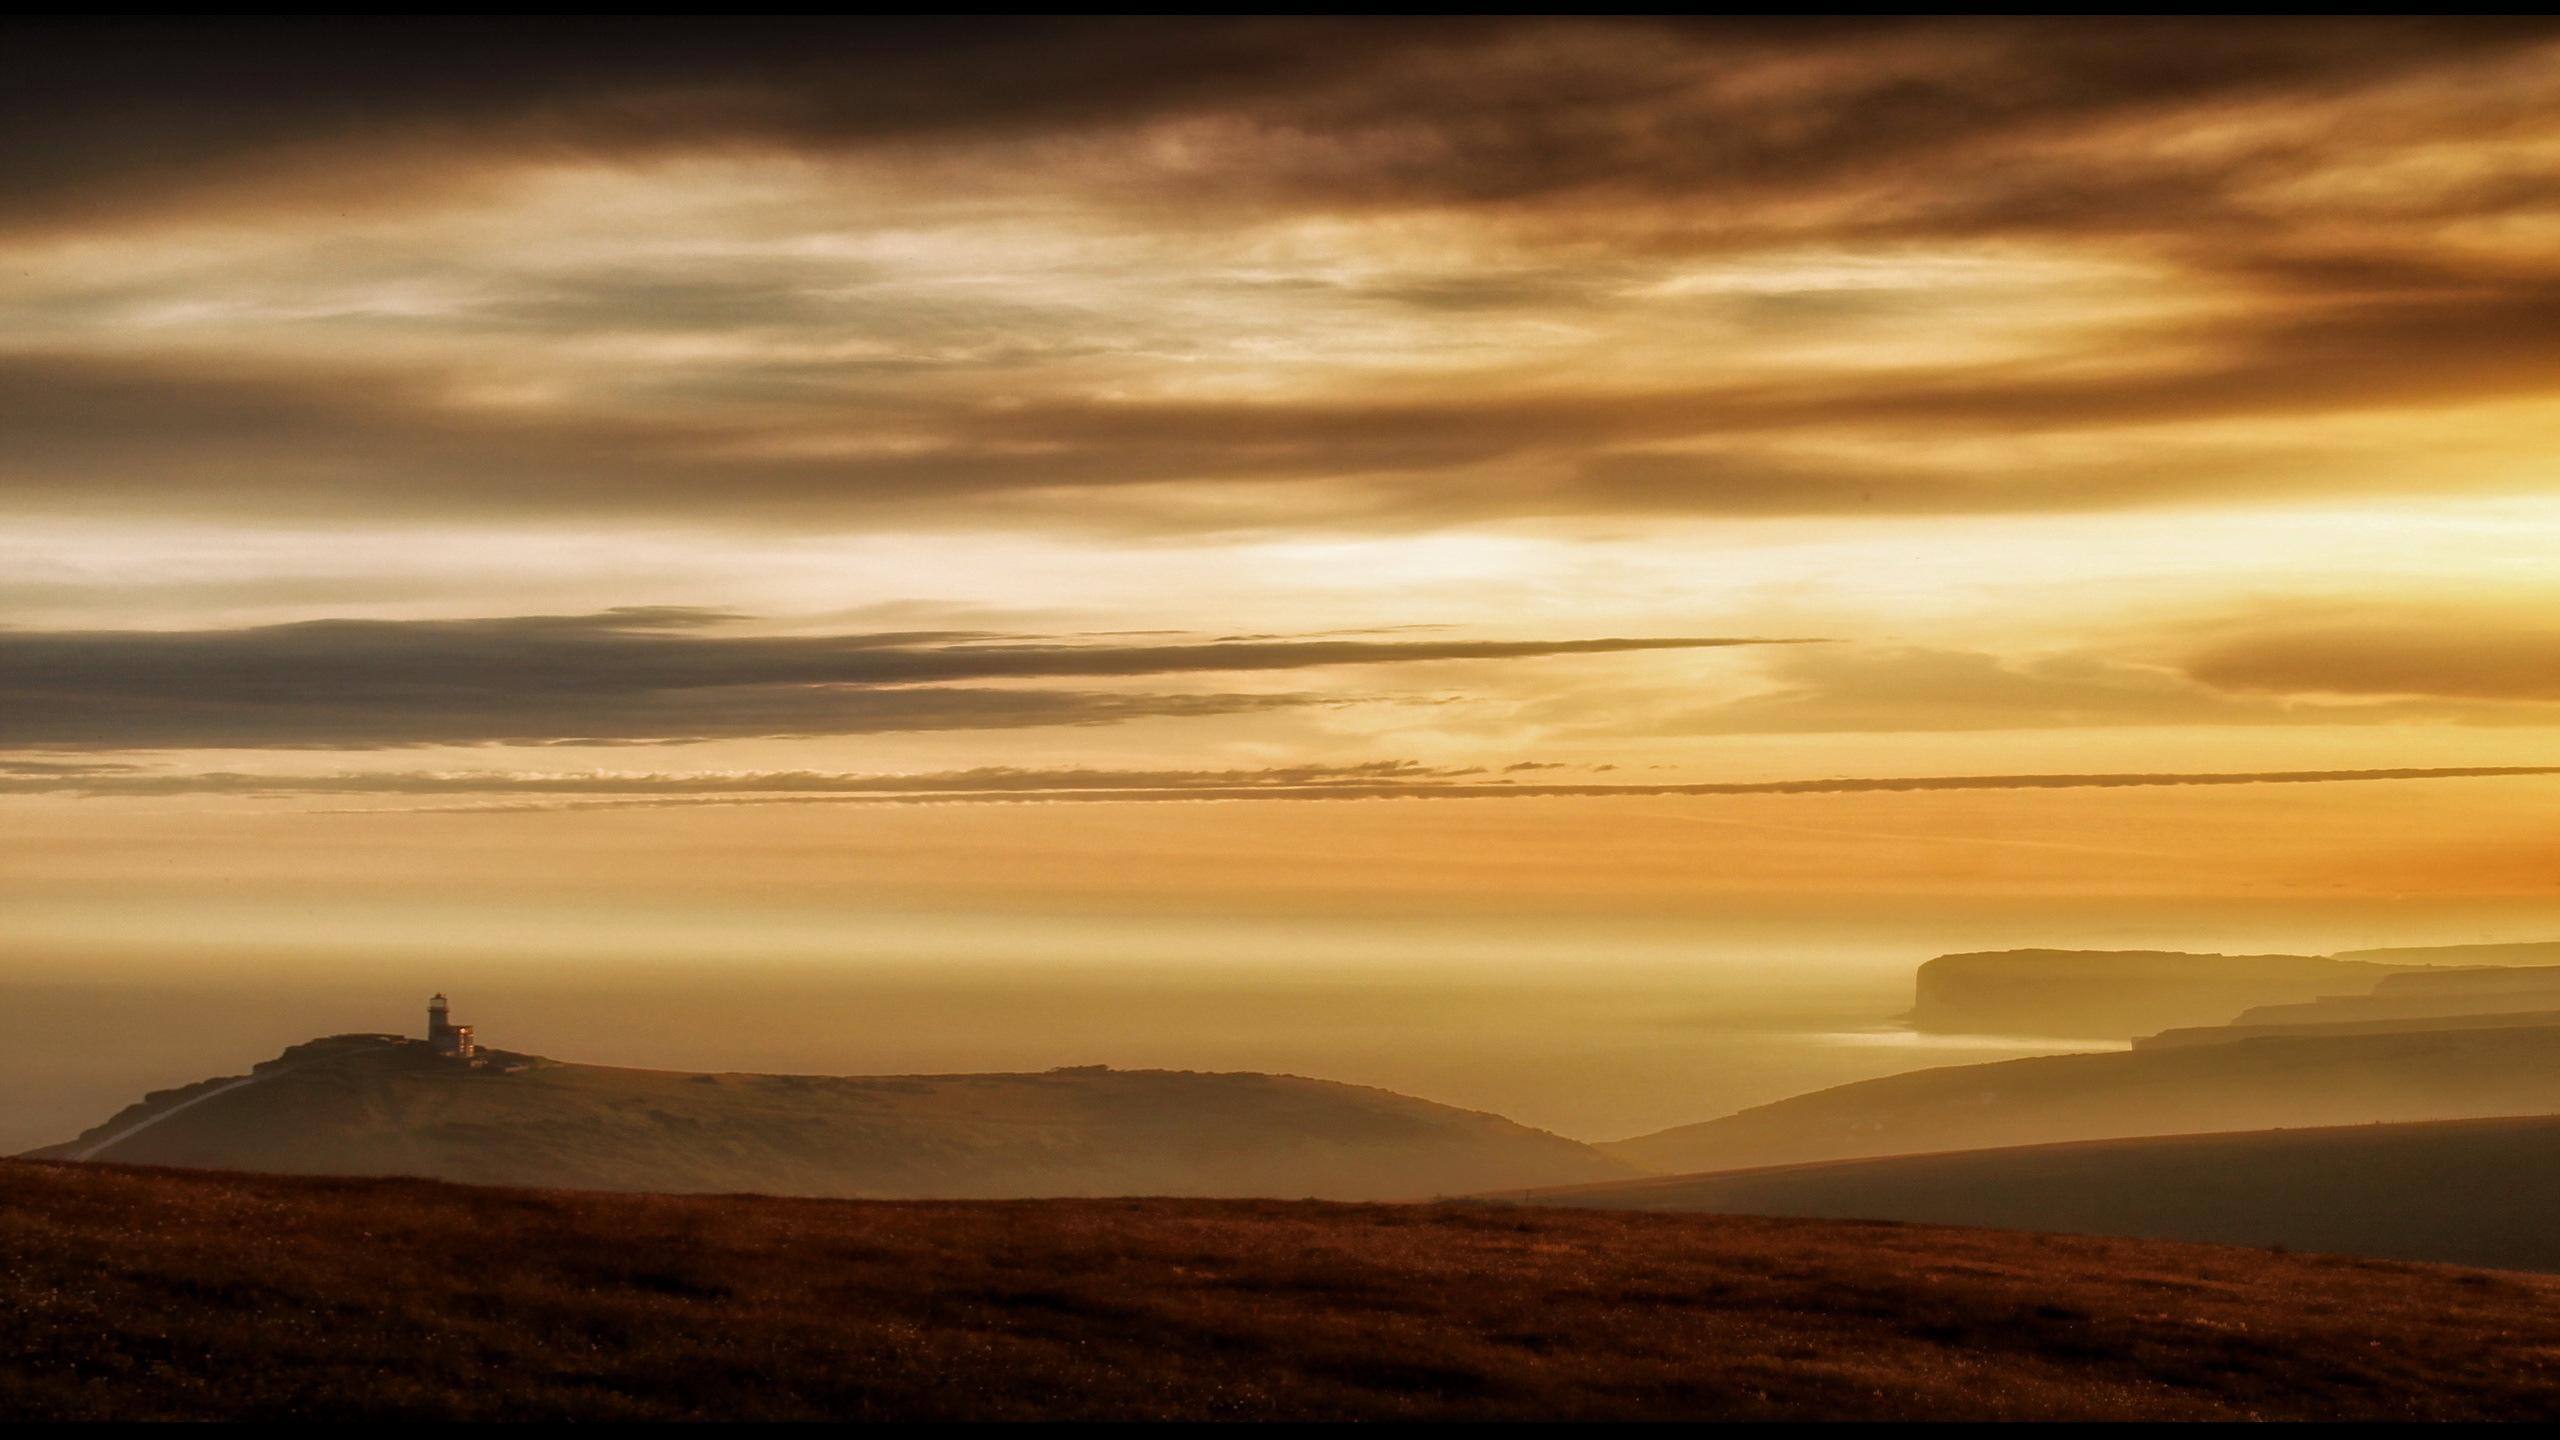 sunset landscape sea ocean sky clouds fog wallpaper background HD Wide Wallpaper for Widescreen